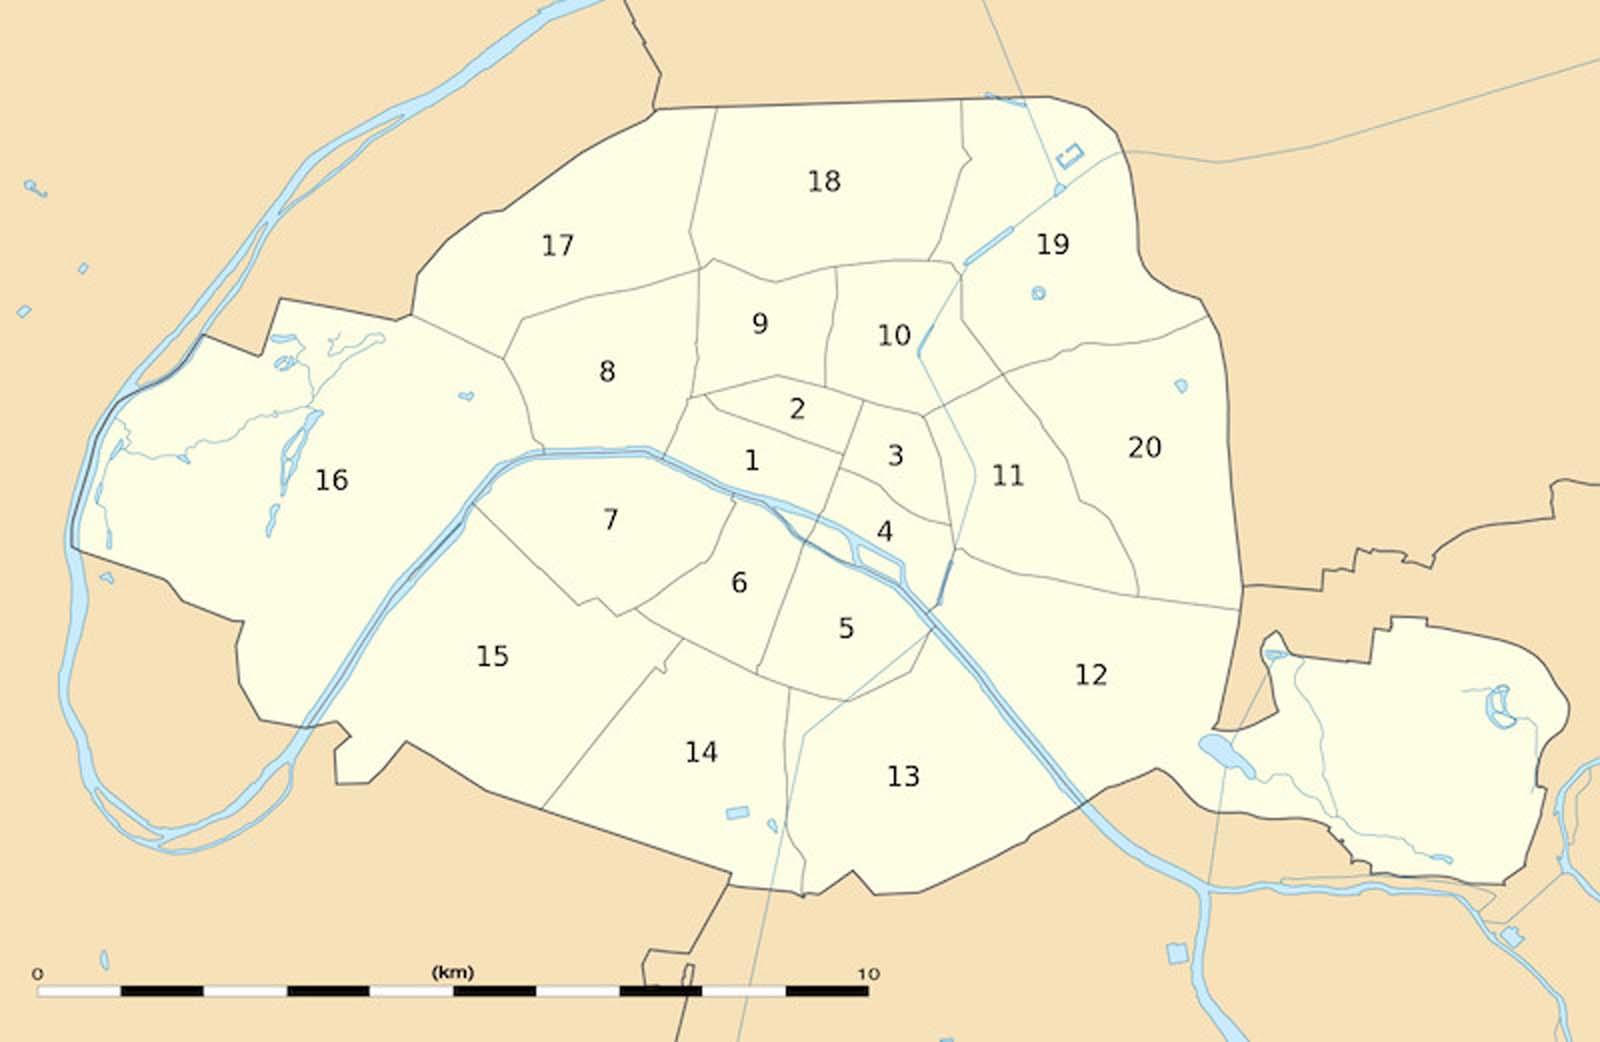 Paris neighbourhoods arrondissements map